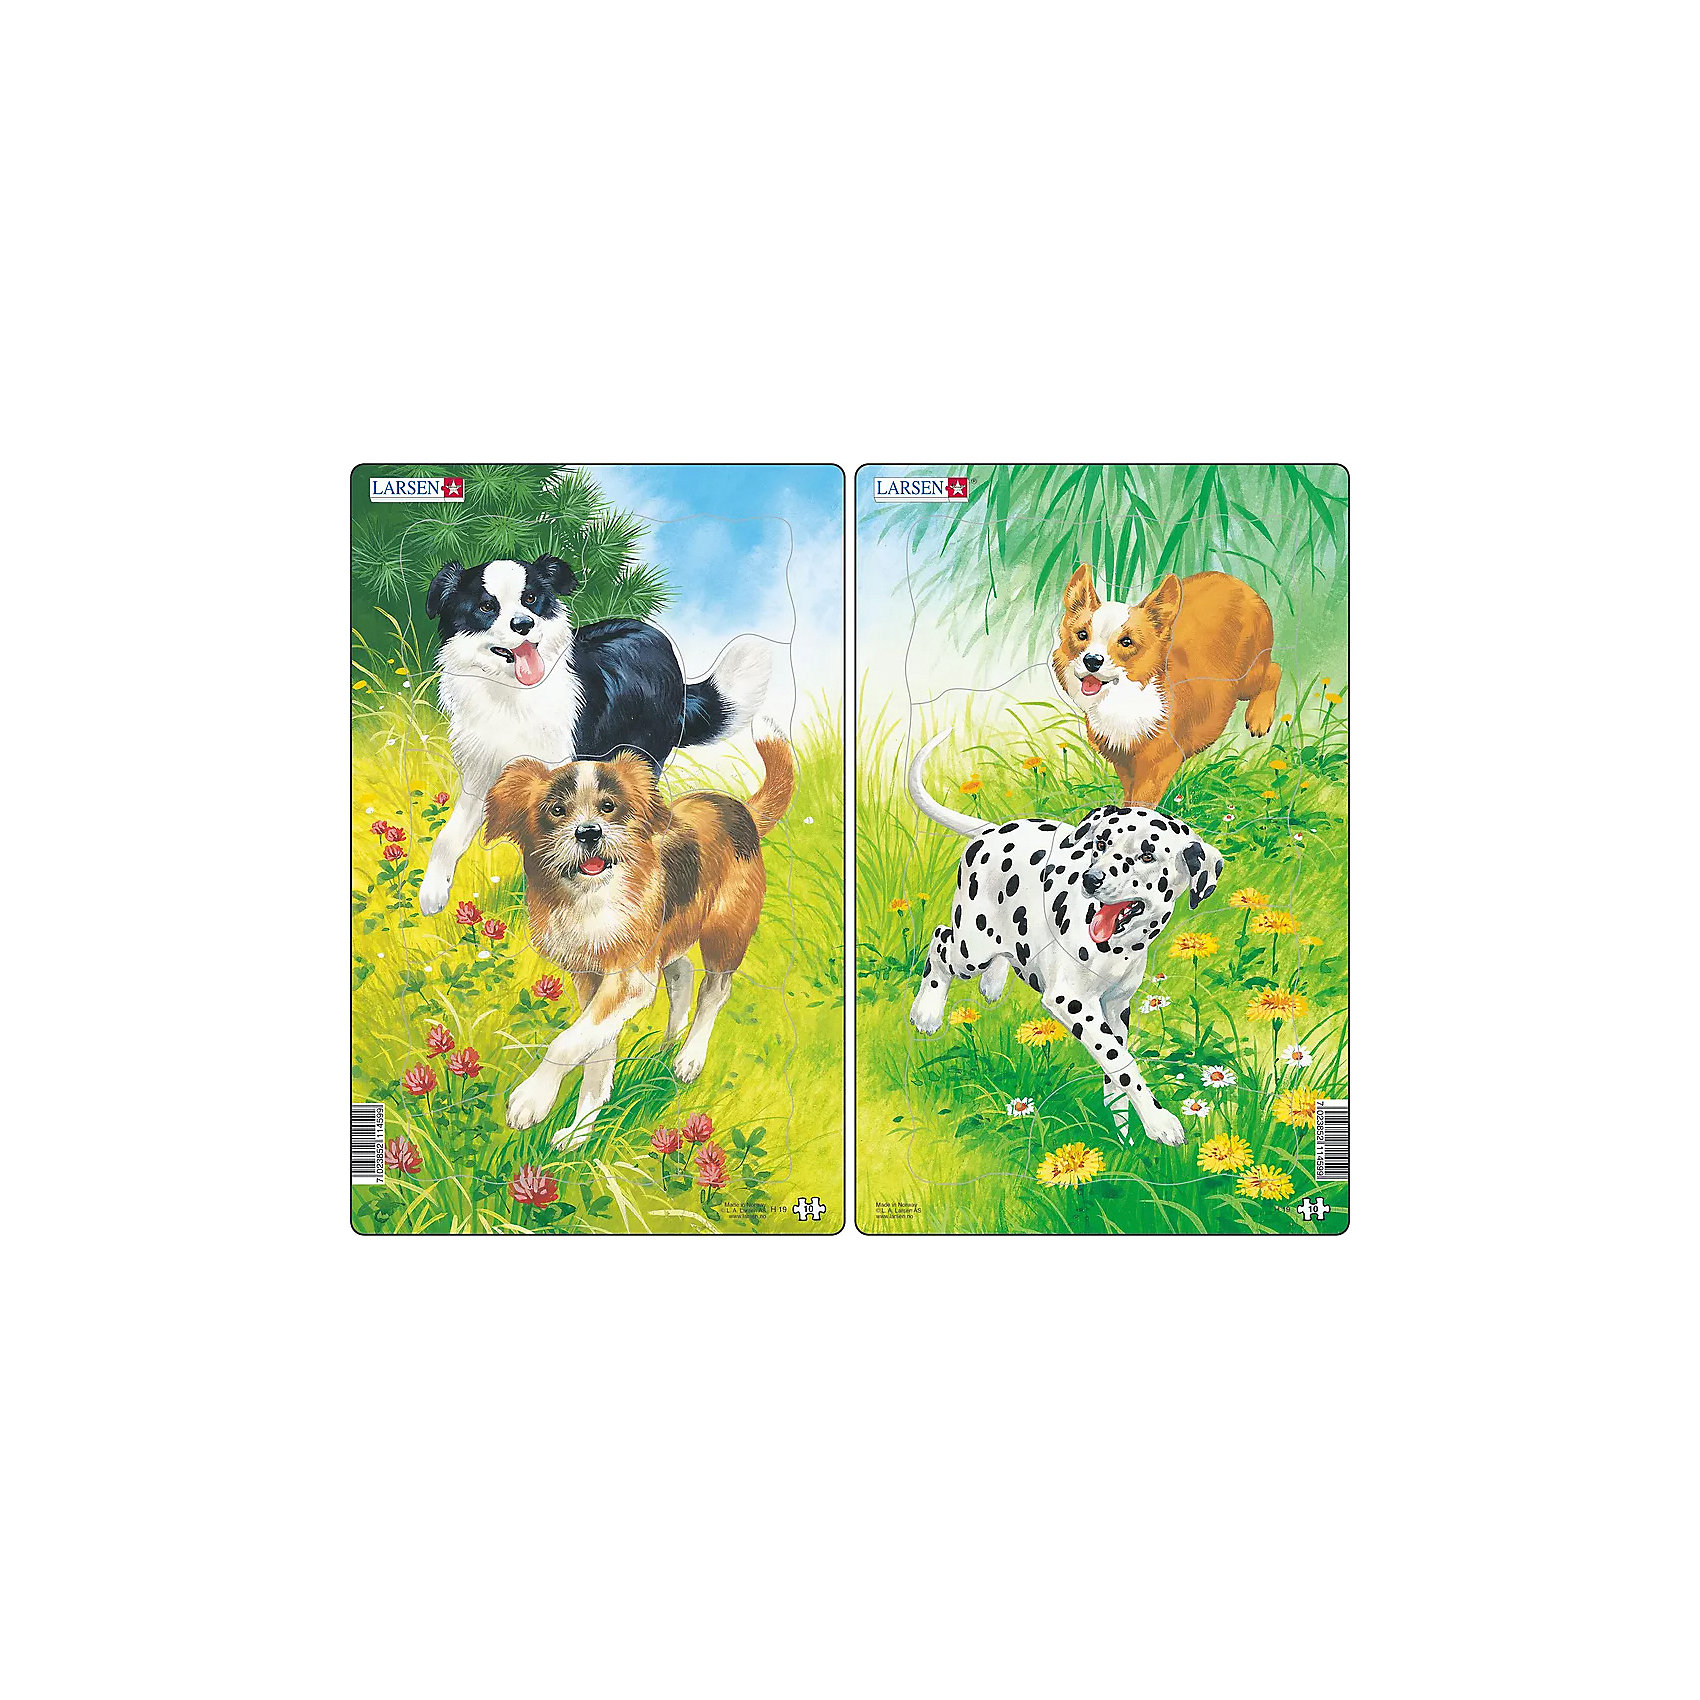 Larsen Пазл Собаки, 10 деталей, Larsen пазлы magic pazle объемный 3d пазл эйфелева башня 78x38x35 см